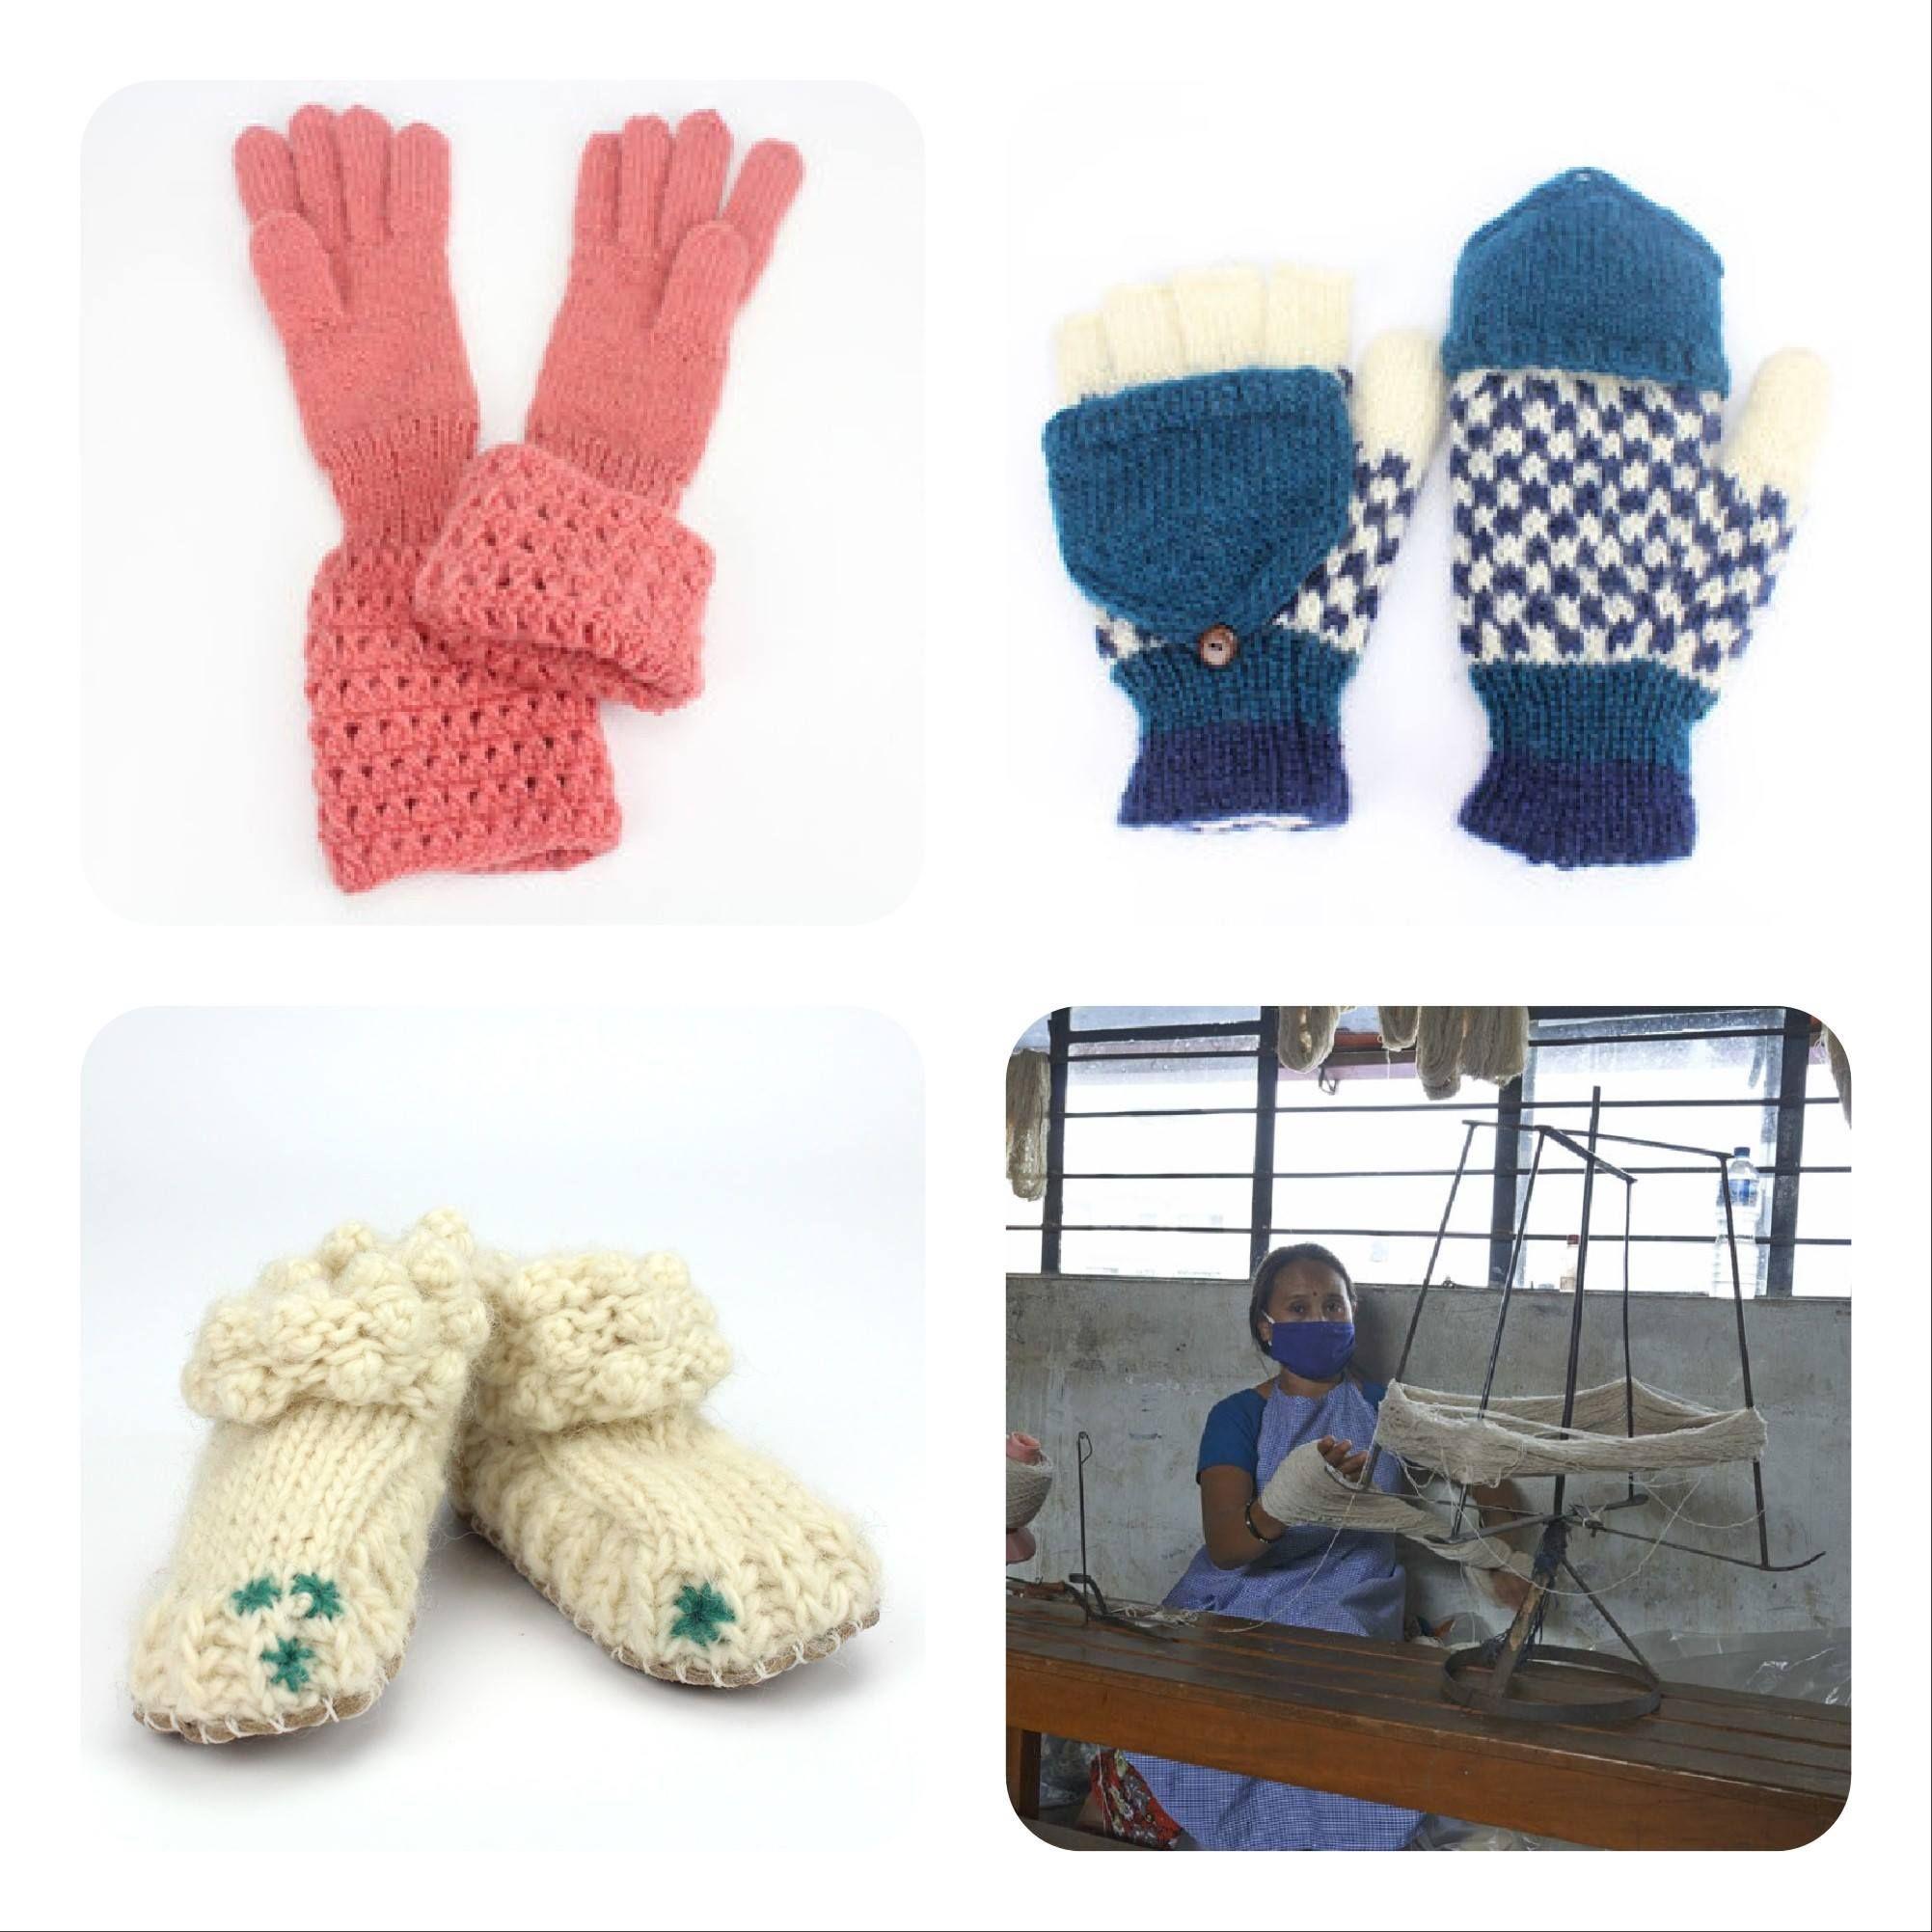 Knitted items Fair from Nepal Jansje design